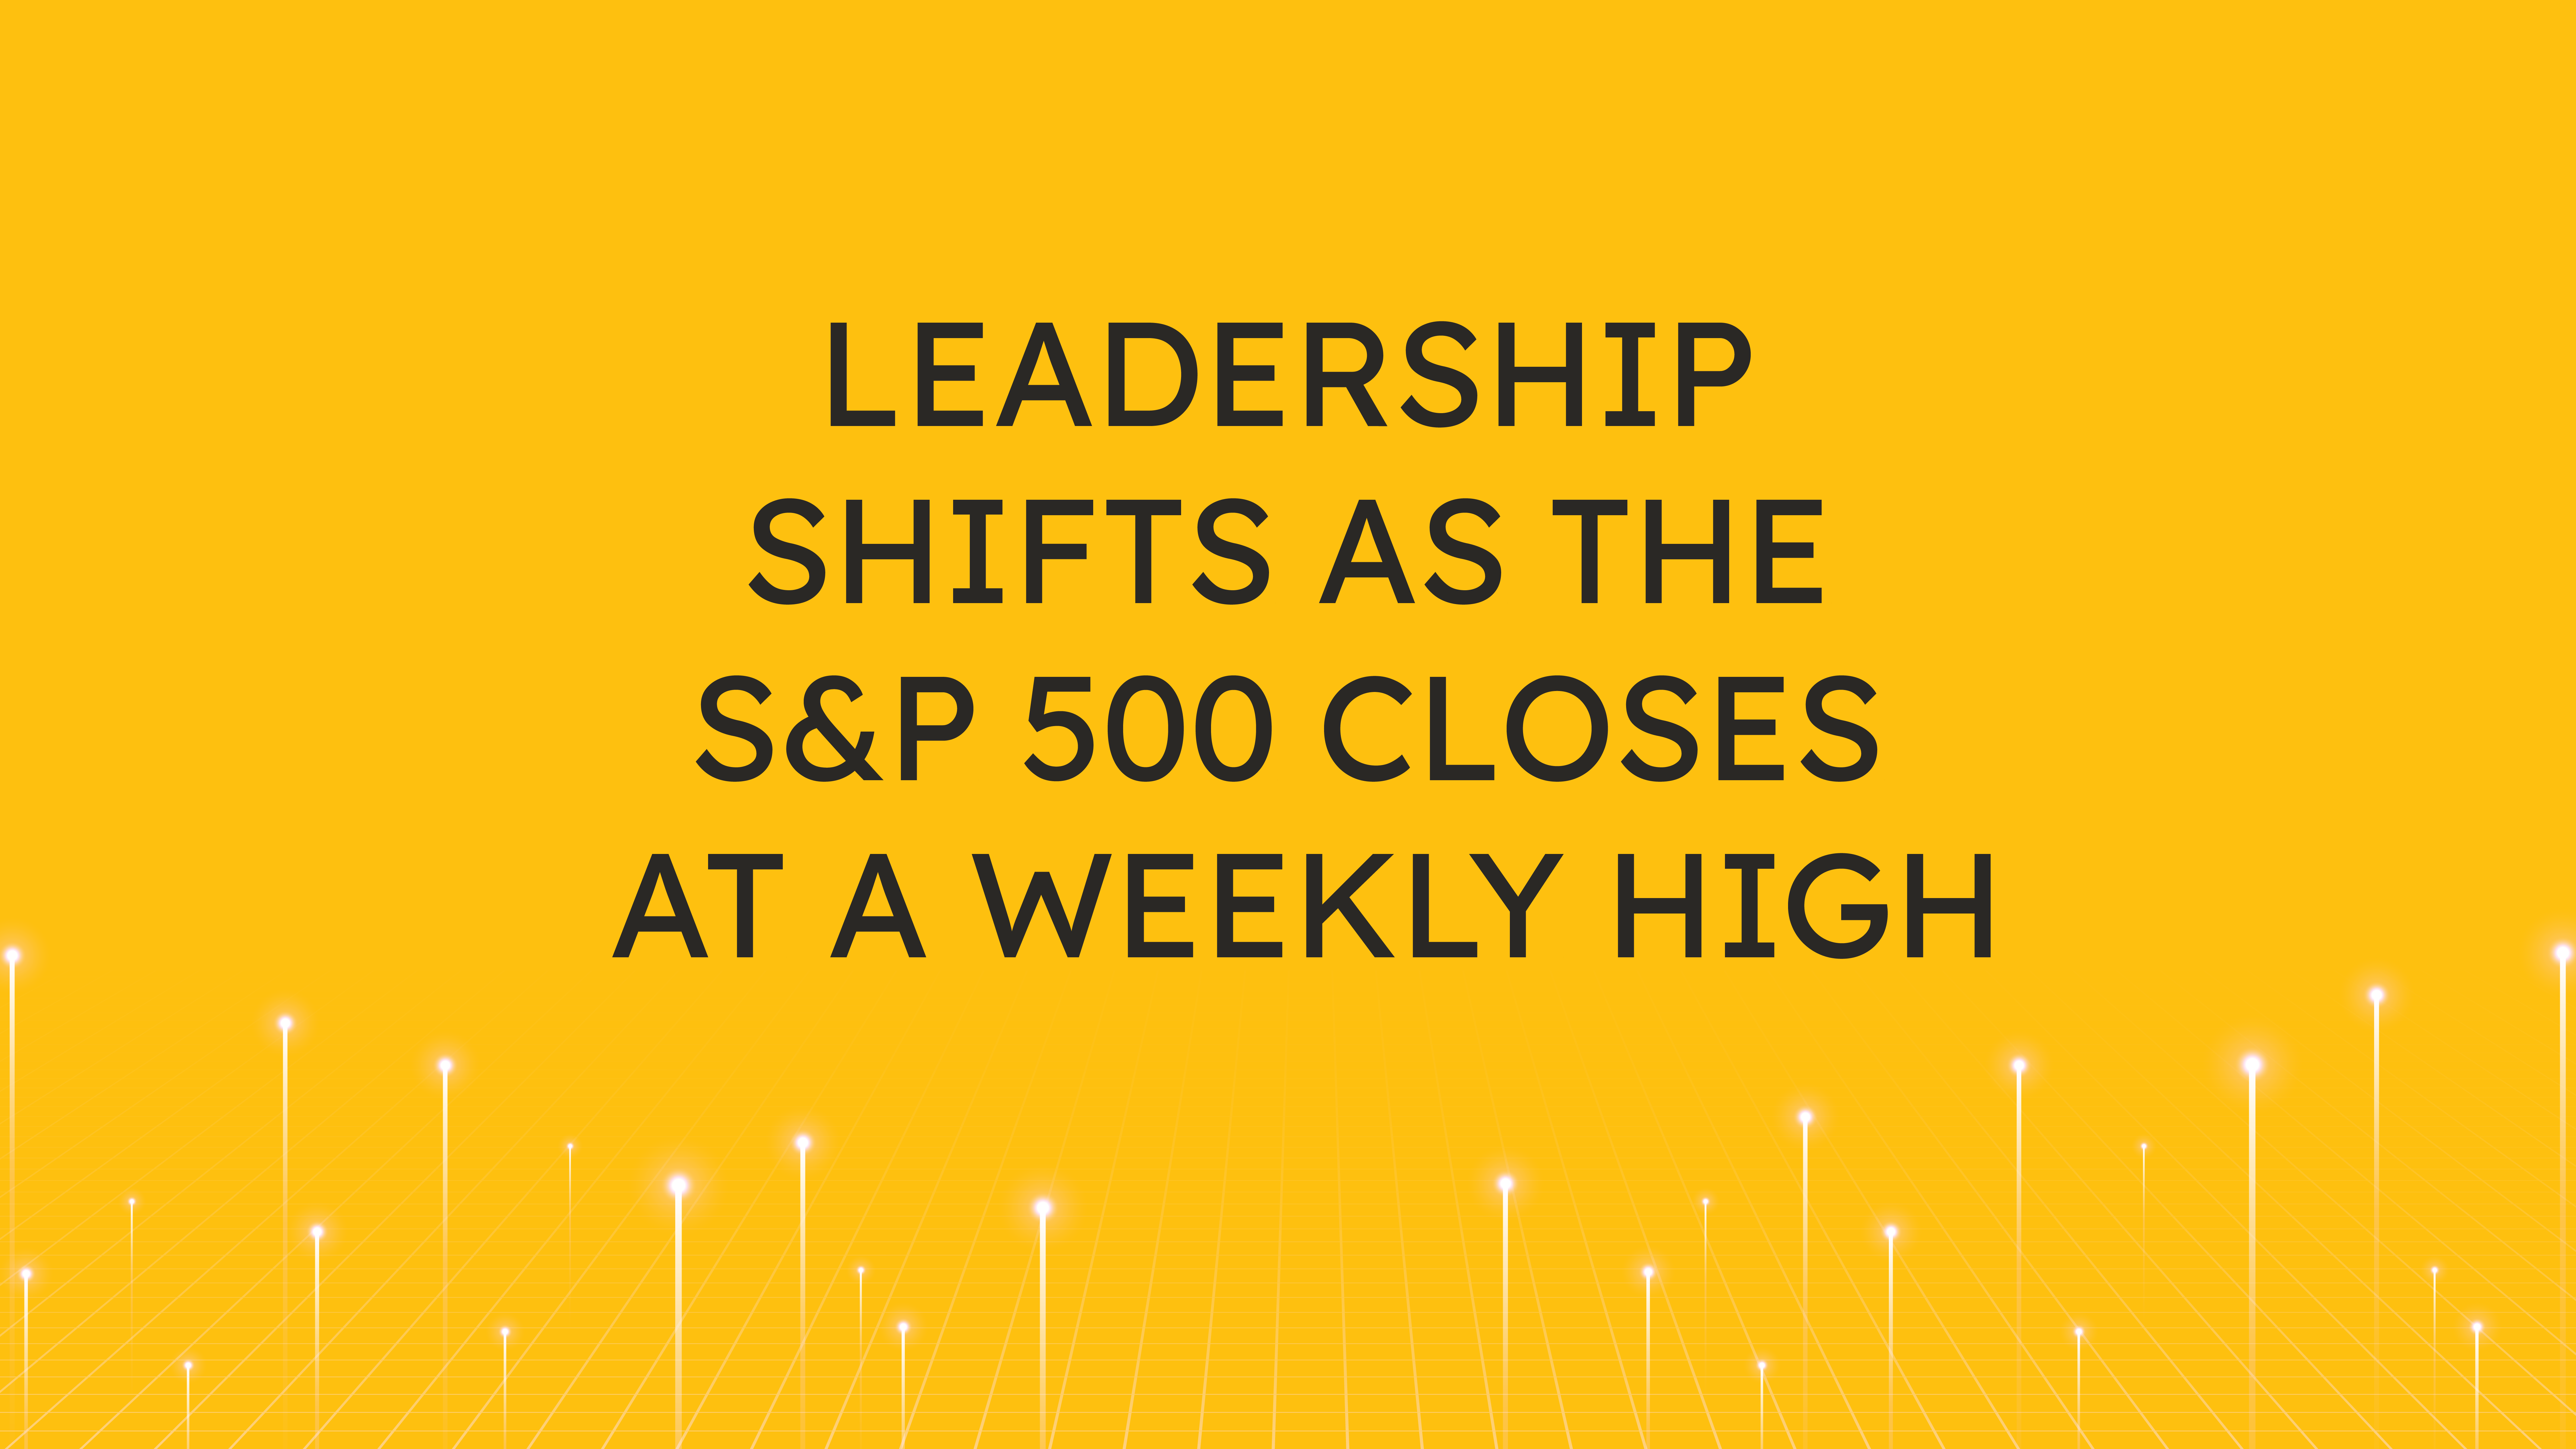 Leadership Shifts as the S&P 500  Closes at a Weekly High